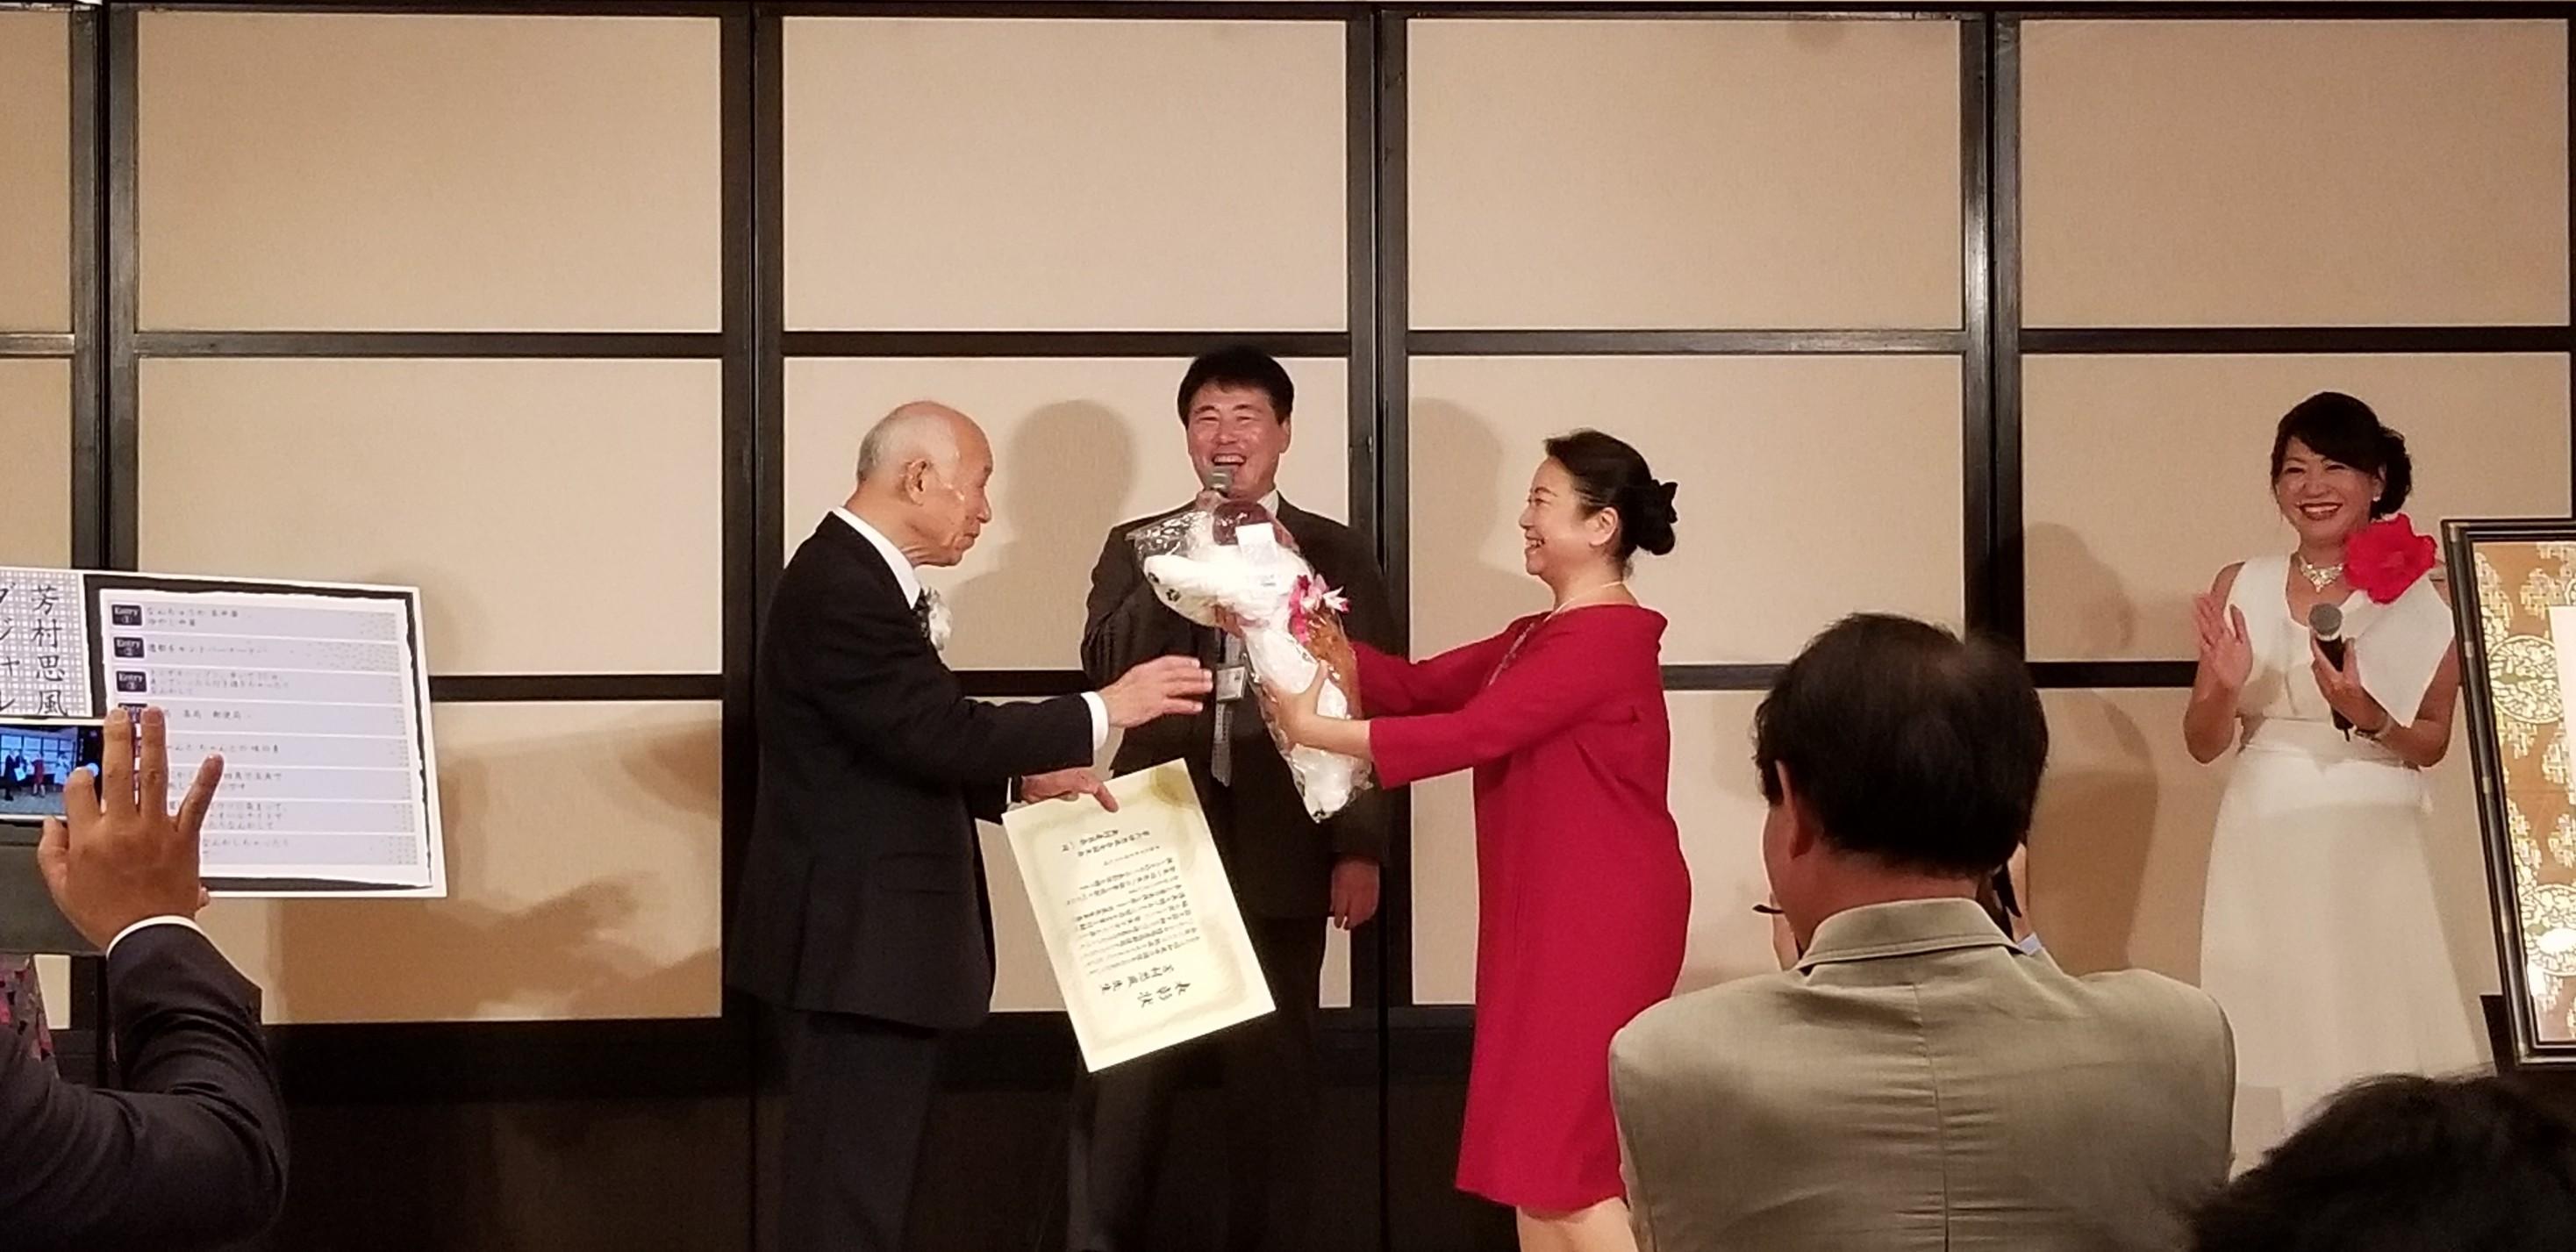 755cc89c2ac2f508dd62fe010b6bf4c1 - 第6回思風会全国大会2018in東京開催